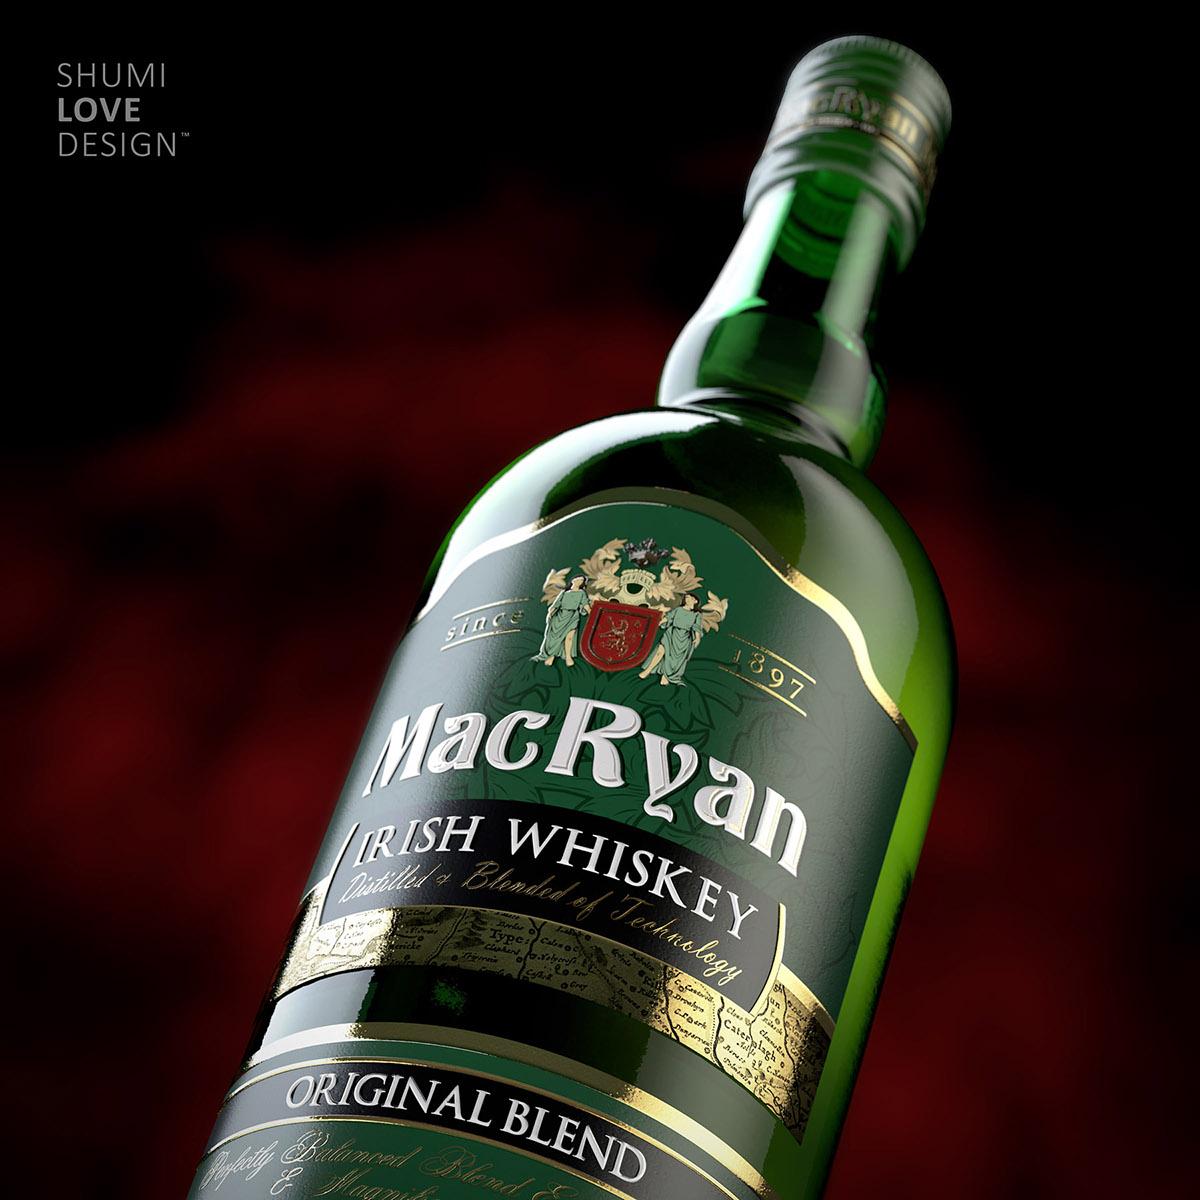 Label label design shumilov Sumilov shumi shumilovedesign Whiskey